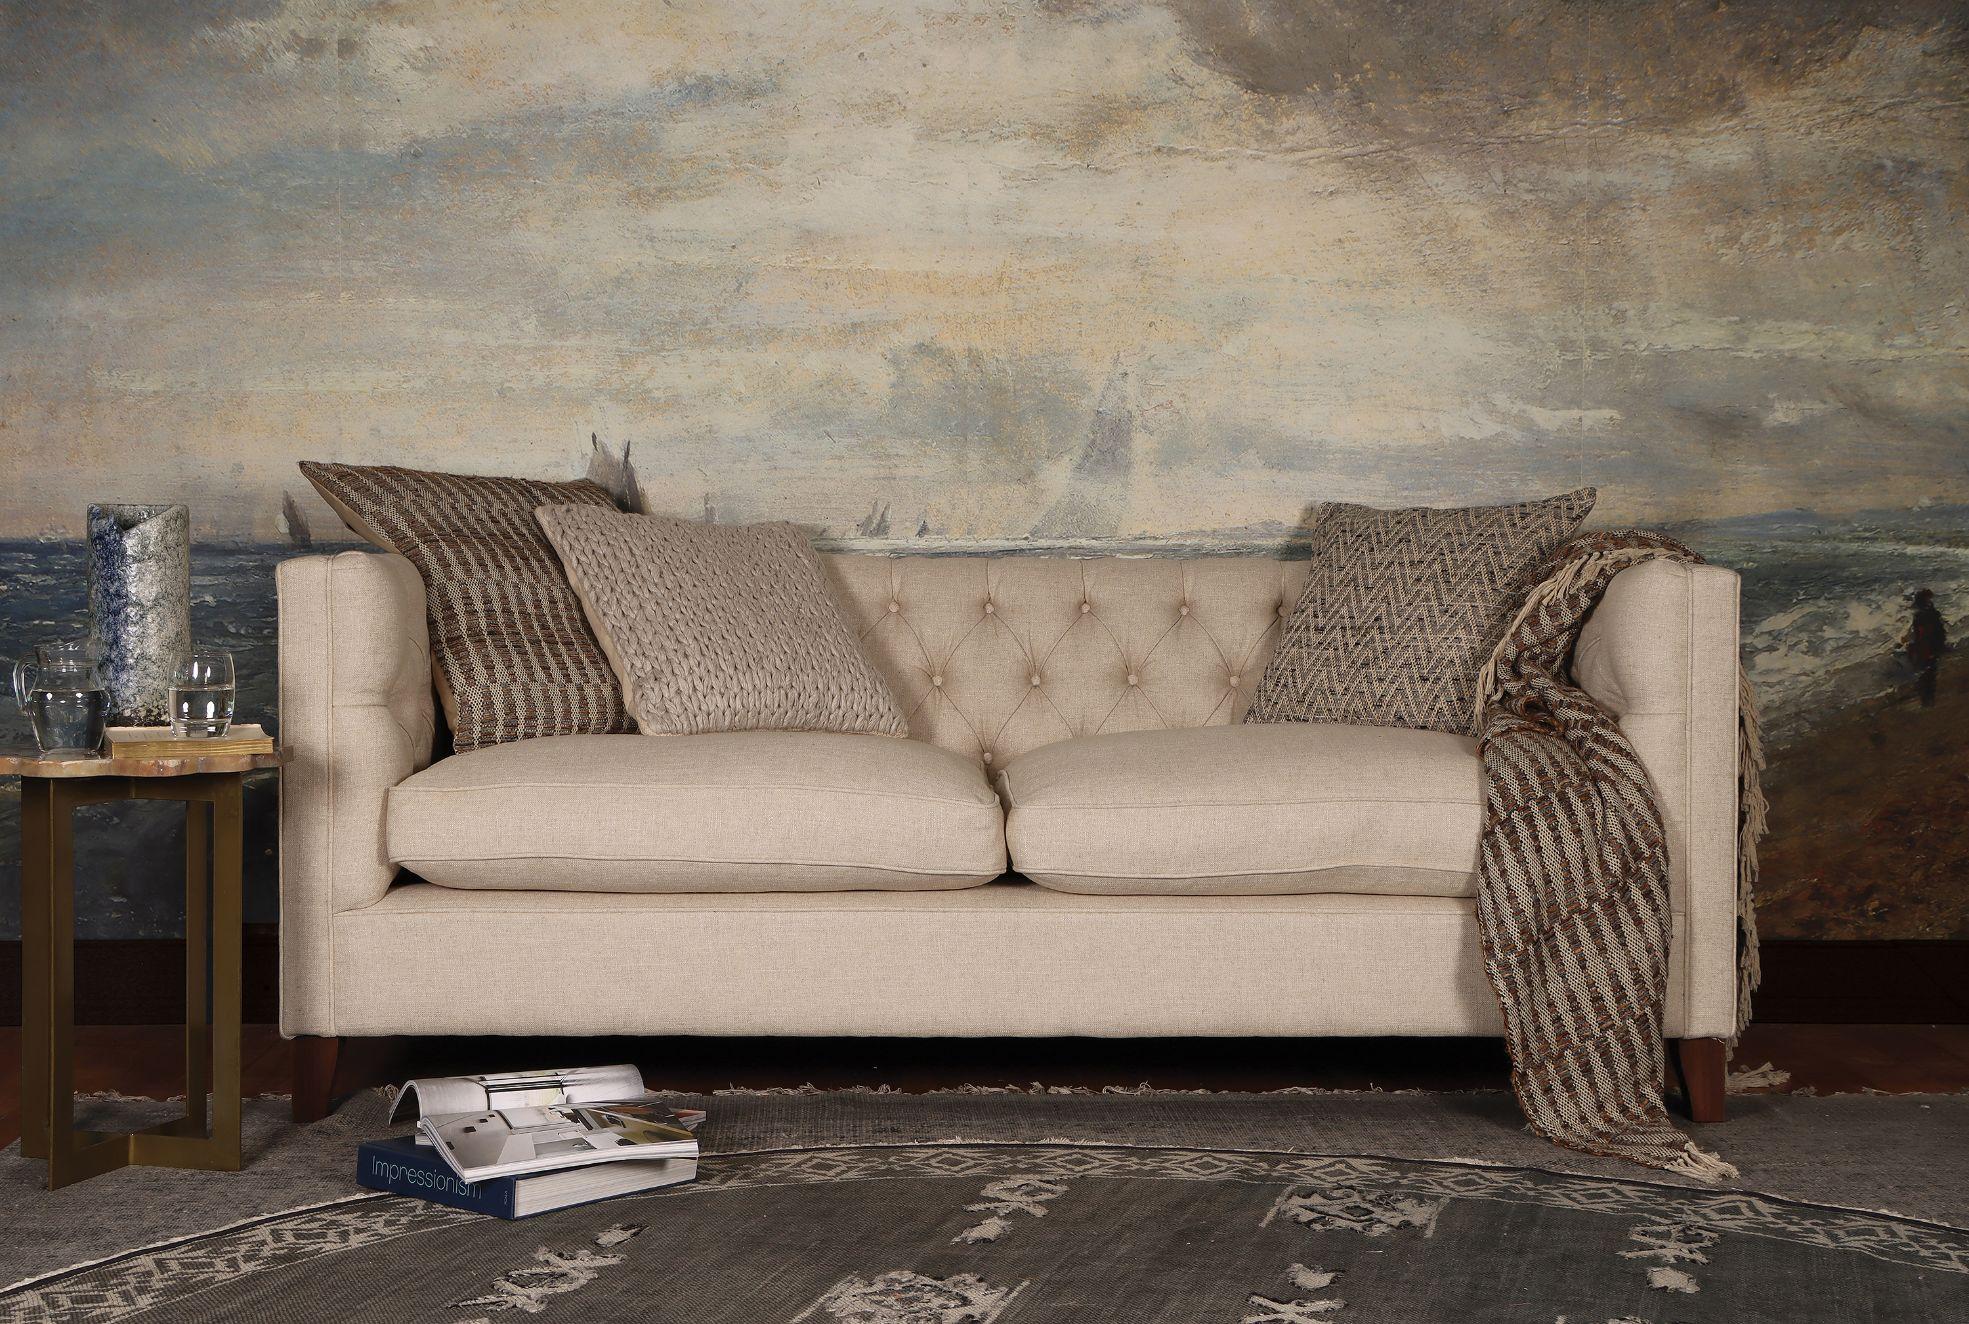 TETRAD HERITAGE - Battersea Midi Sofa